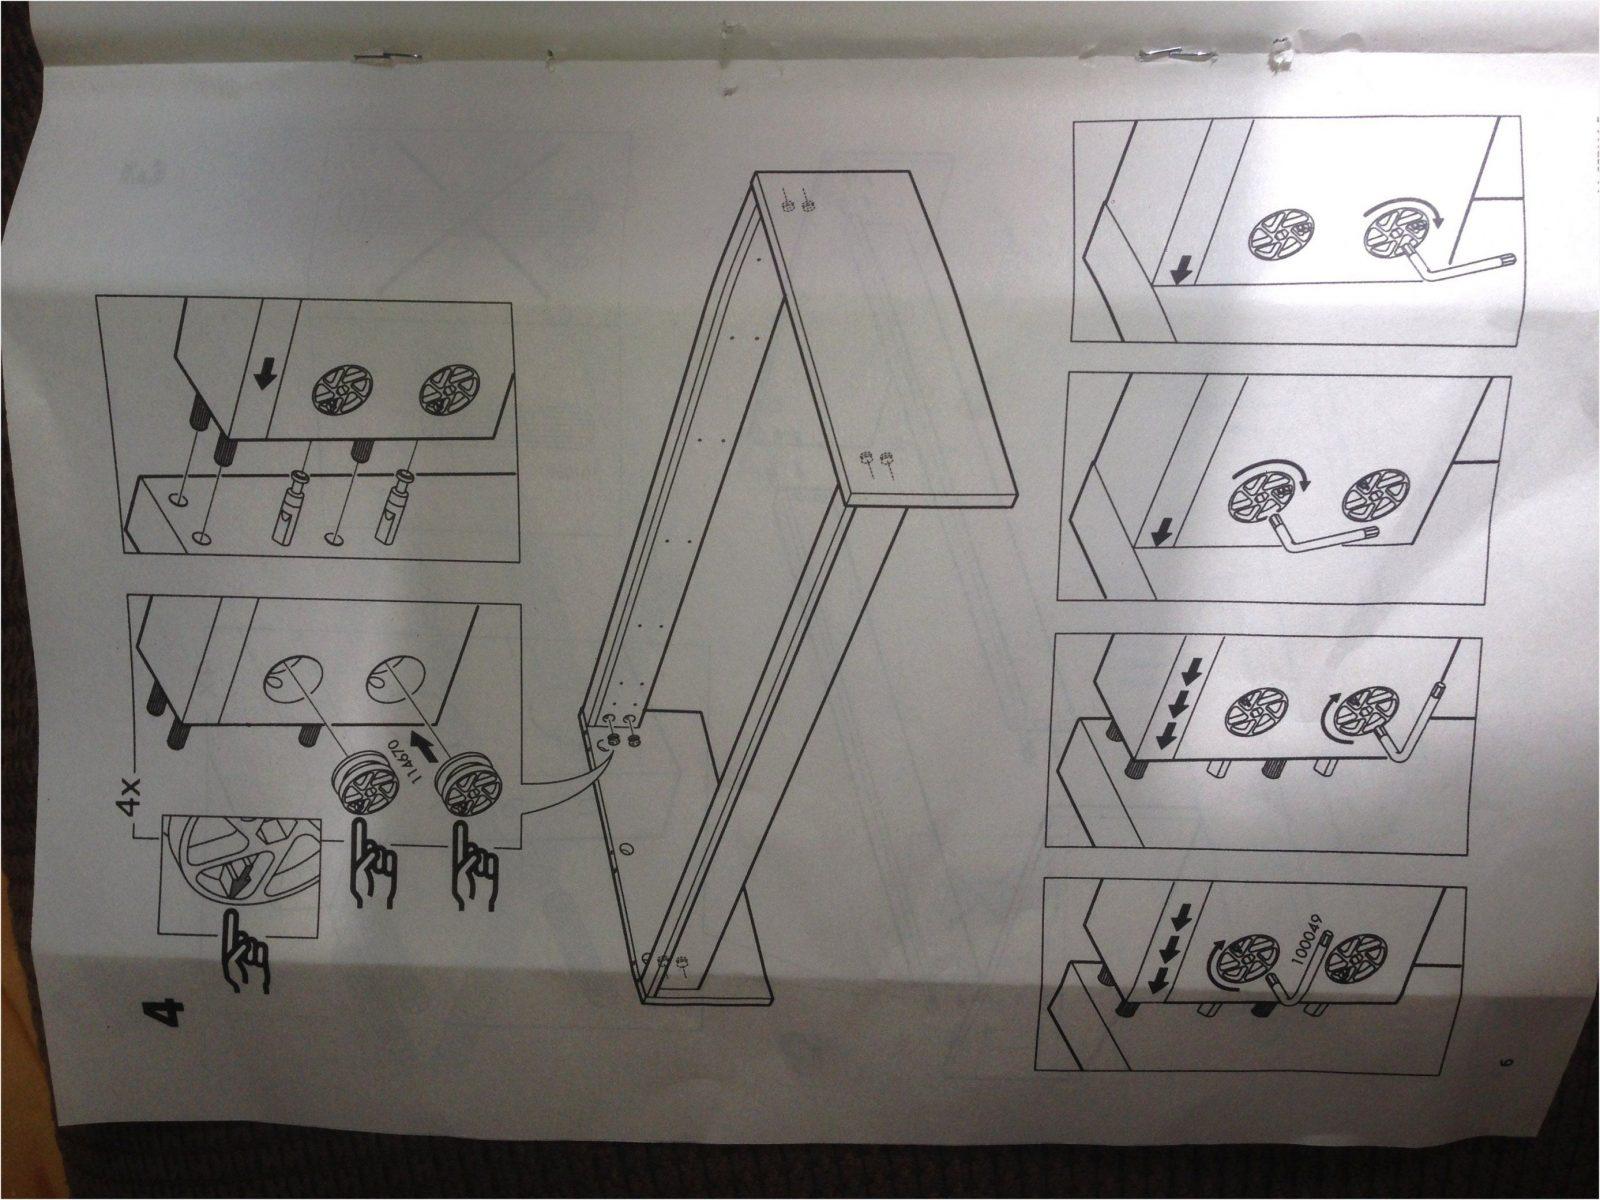 Ikea Malm Bett Anleitung Bild Das Sieht Elegantes 1mcontrol Von Ikea